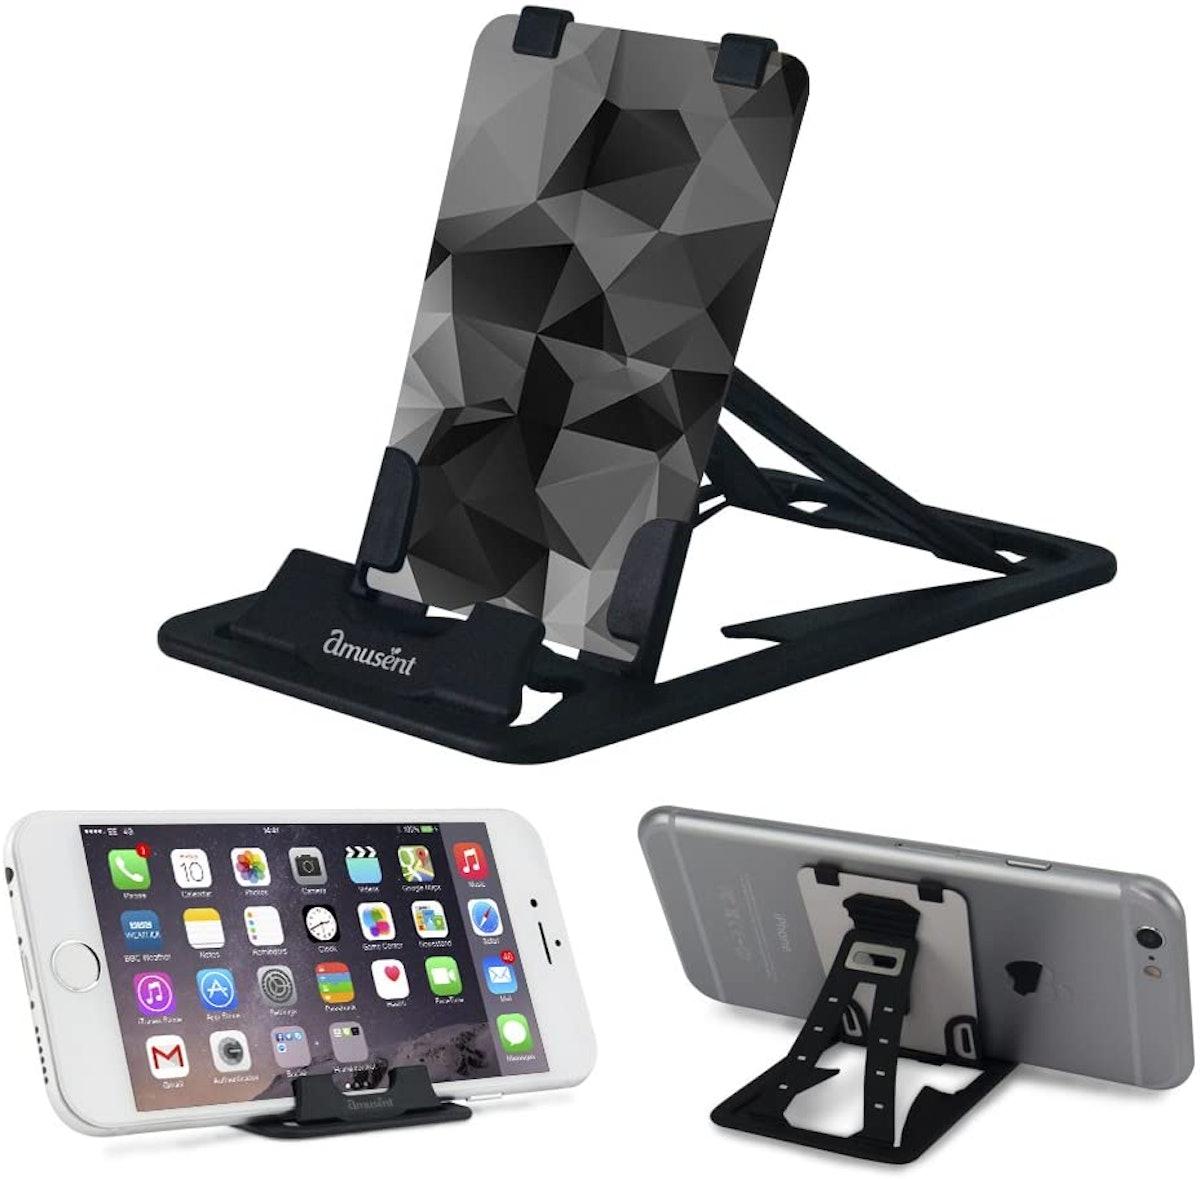 Amusement Smartphone Stand